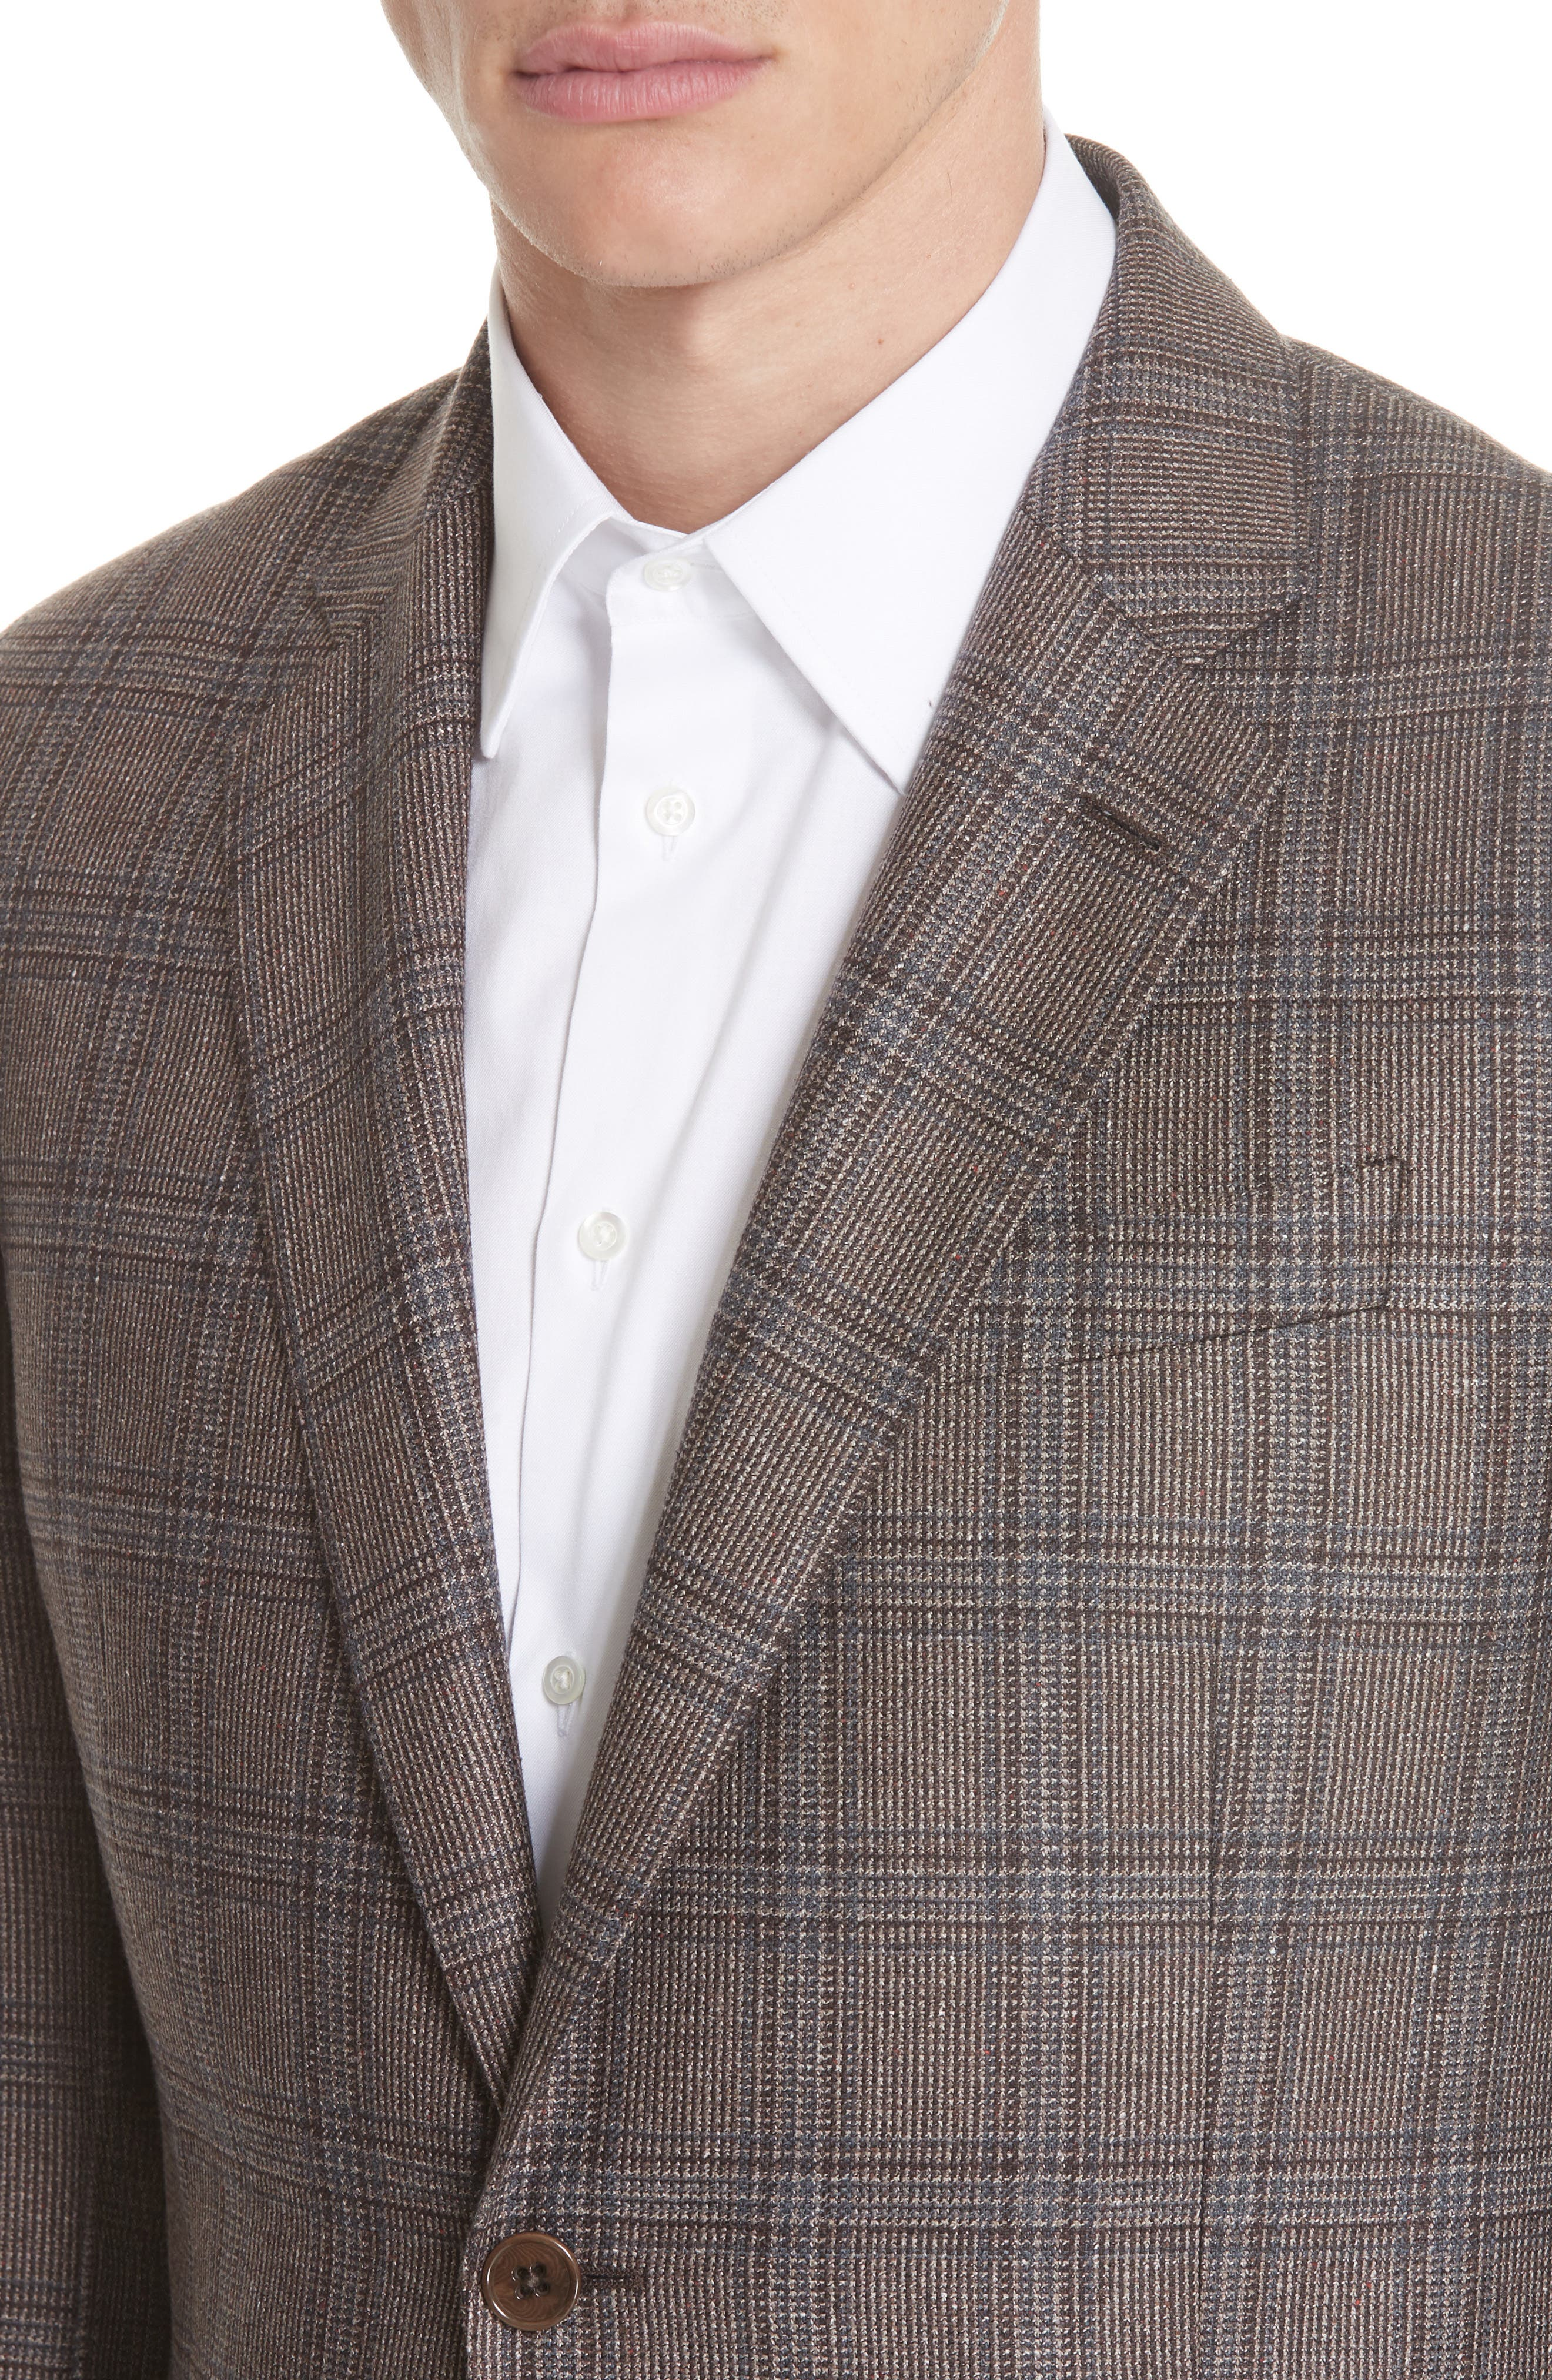 G Line Trim Fit Plaid Silk & Wool Sport Coat,                             Alternate thumbnail 4, color,                             BROWN